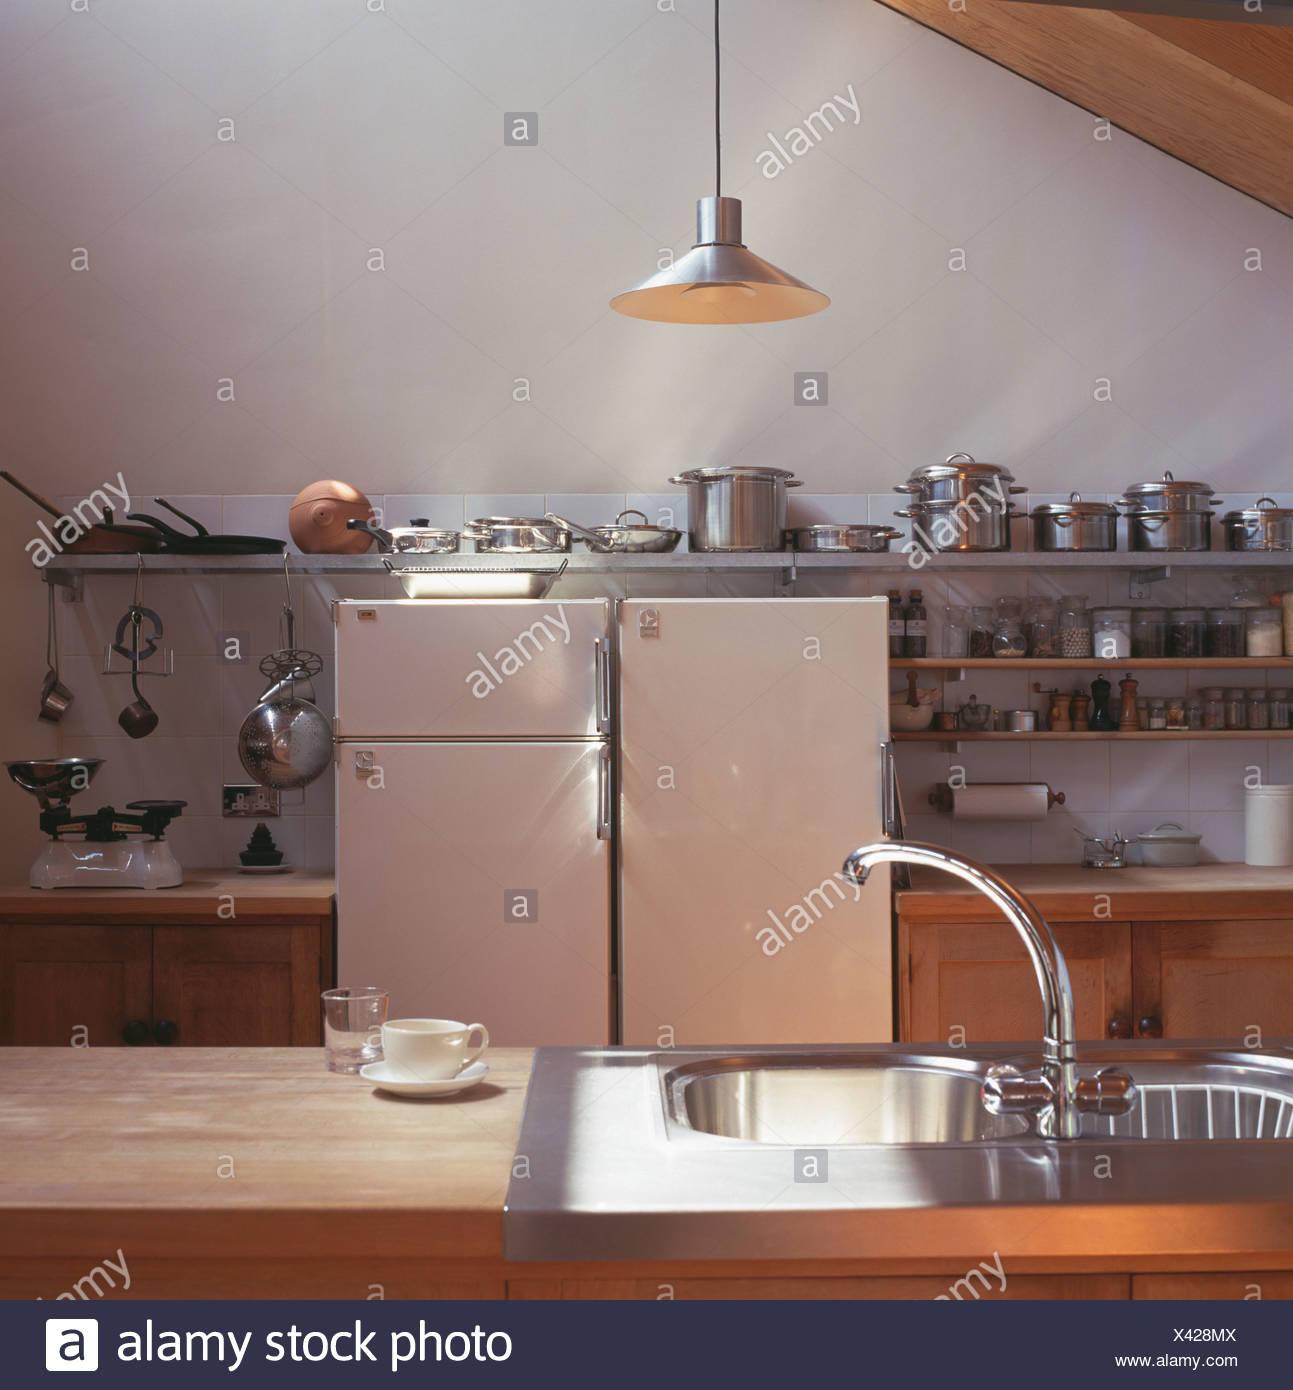 Famoso Cocina De La Casa Se Hunde Reino Unido Ideas - Ideas de ...